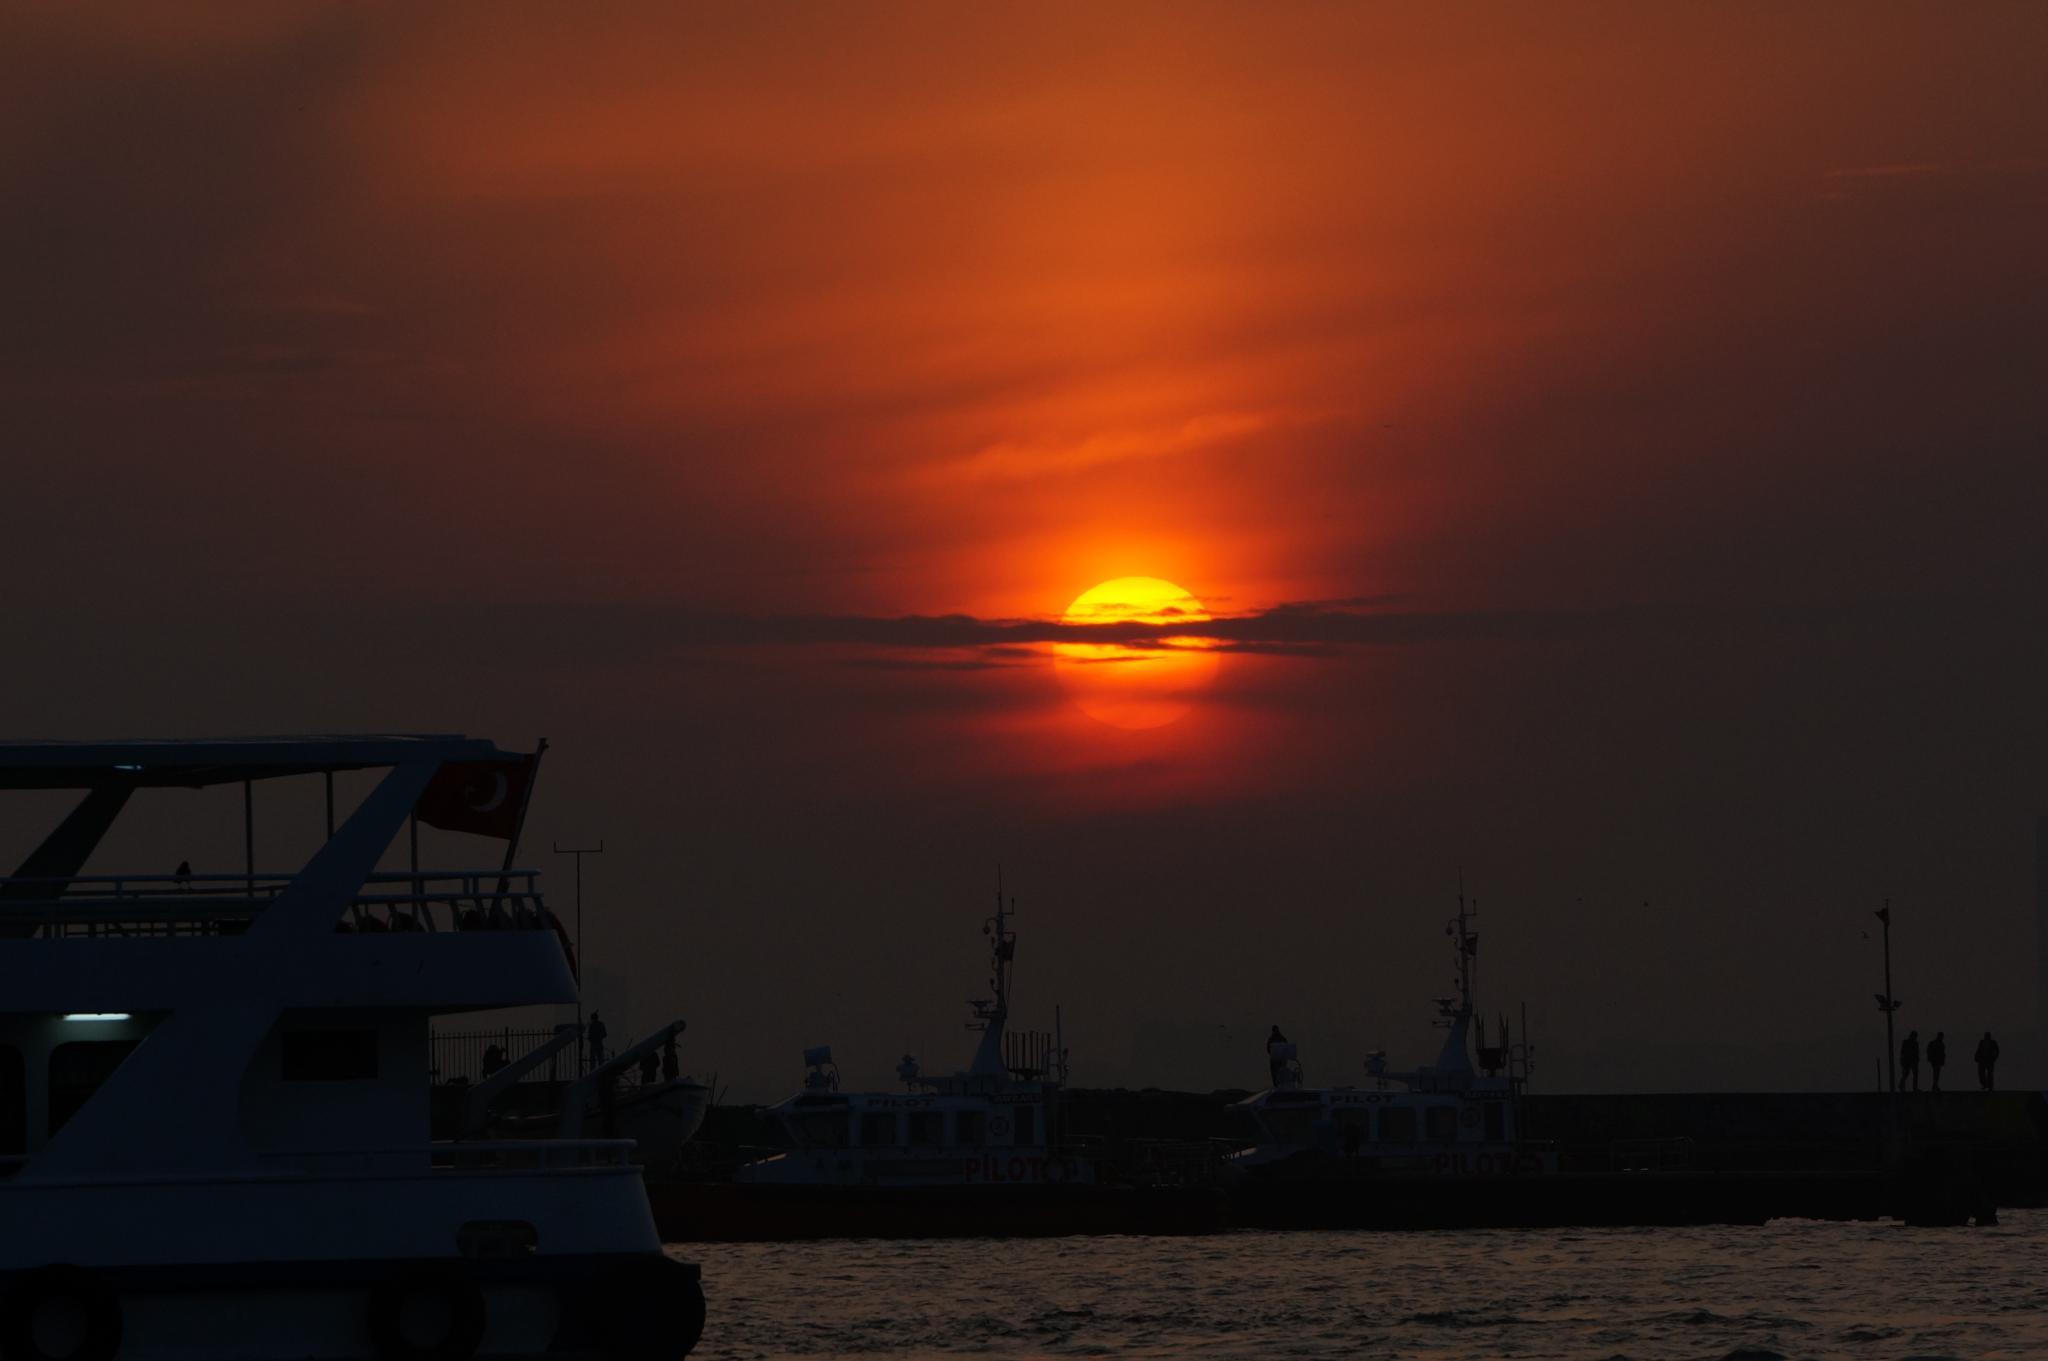 sunset on wave set  by Yavuz Sevgi